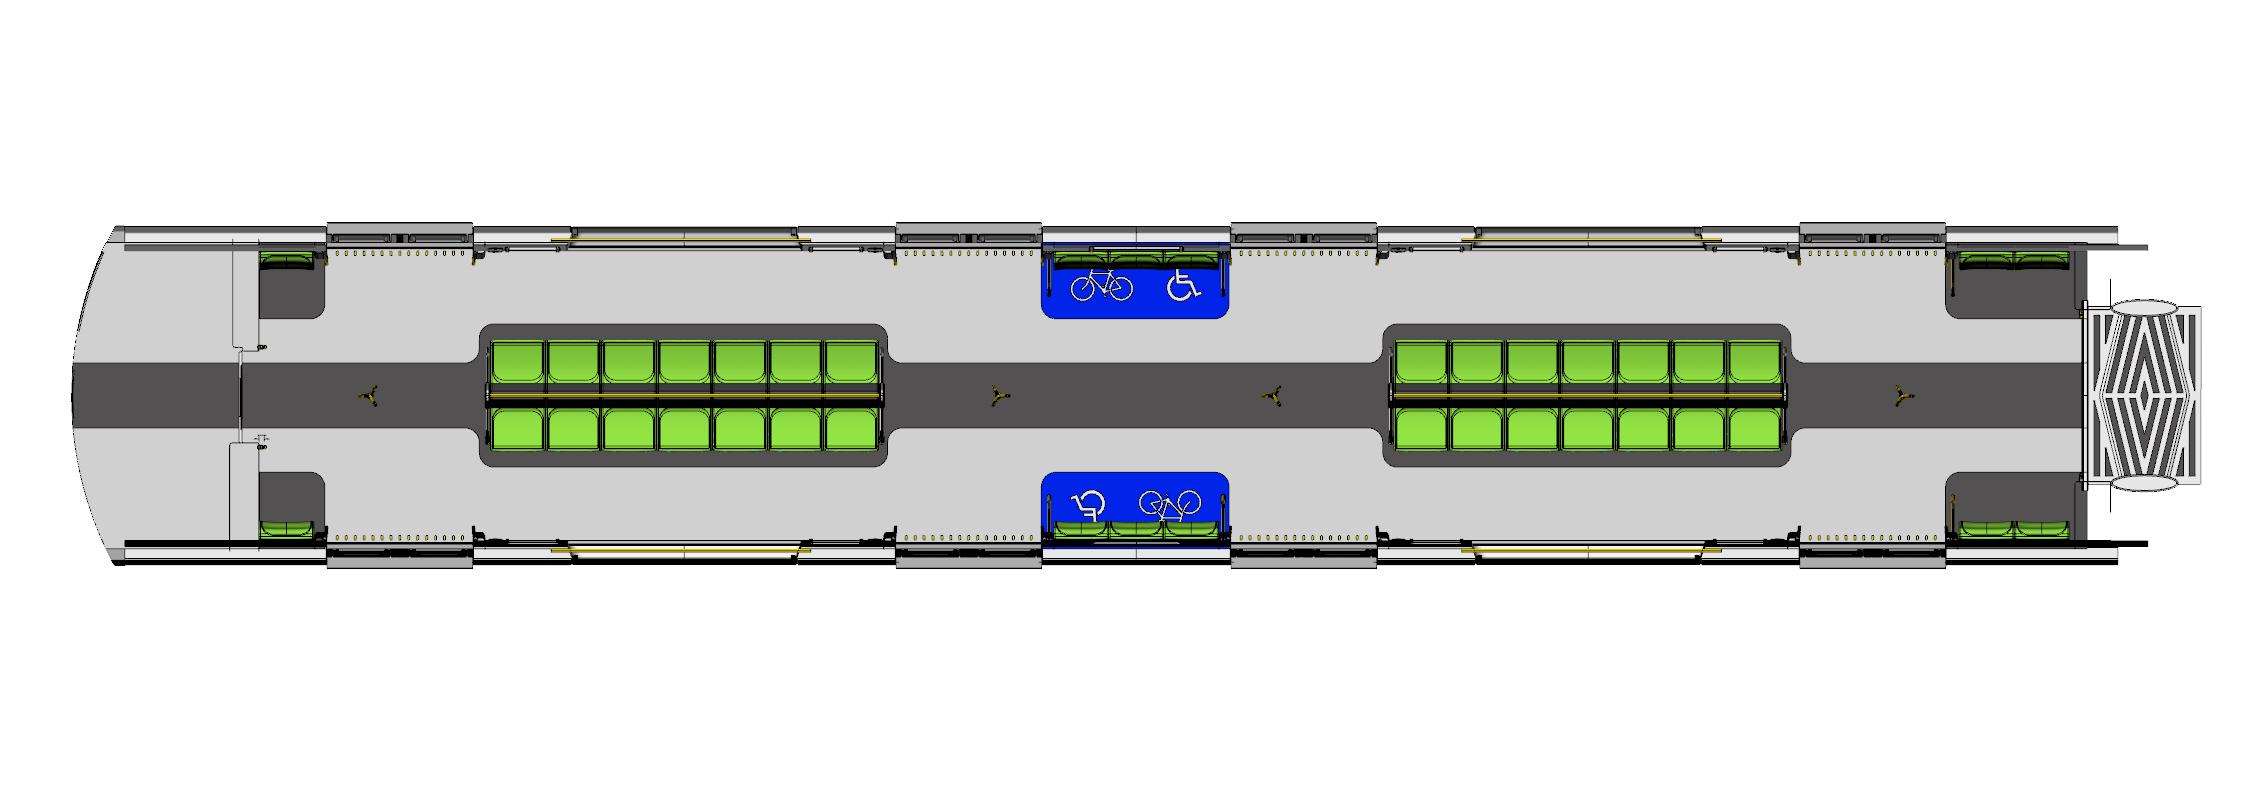 nyct r211 subway car interior carlos pilonieta portfolio. Black Bedroom Furniture Sets. Home Design Ideas